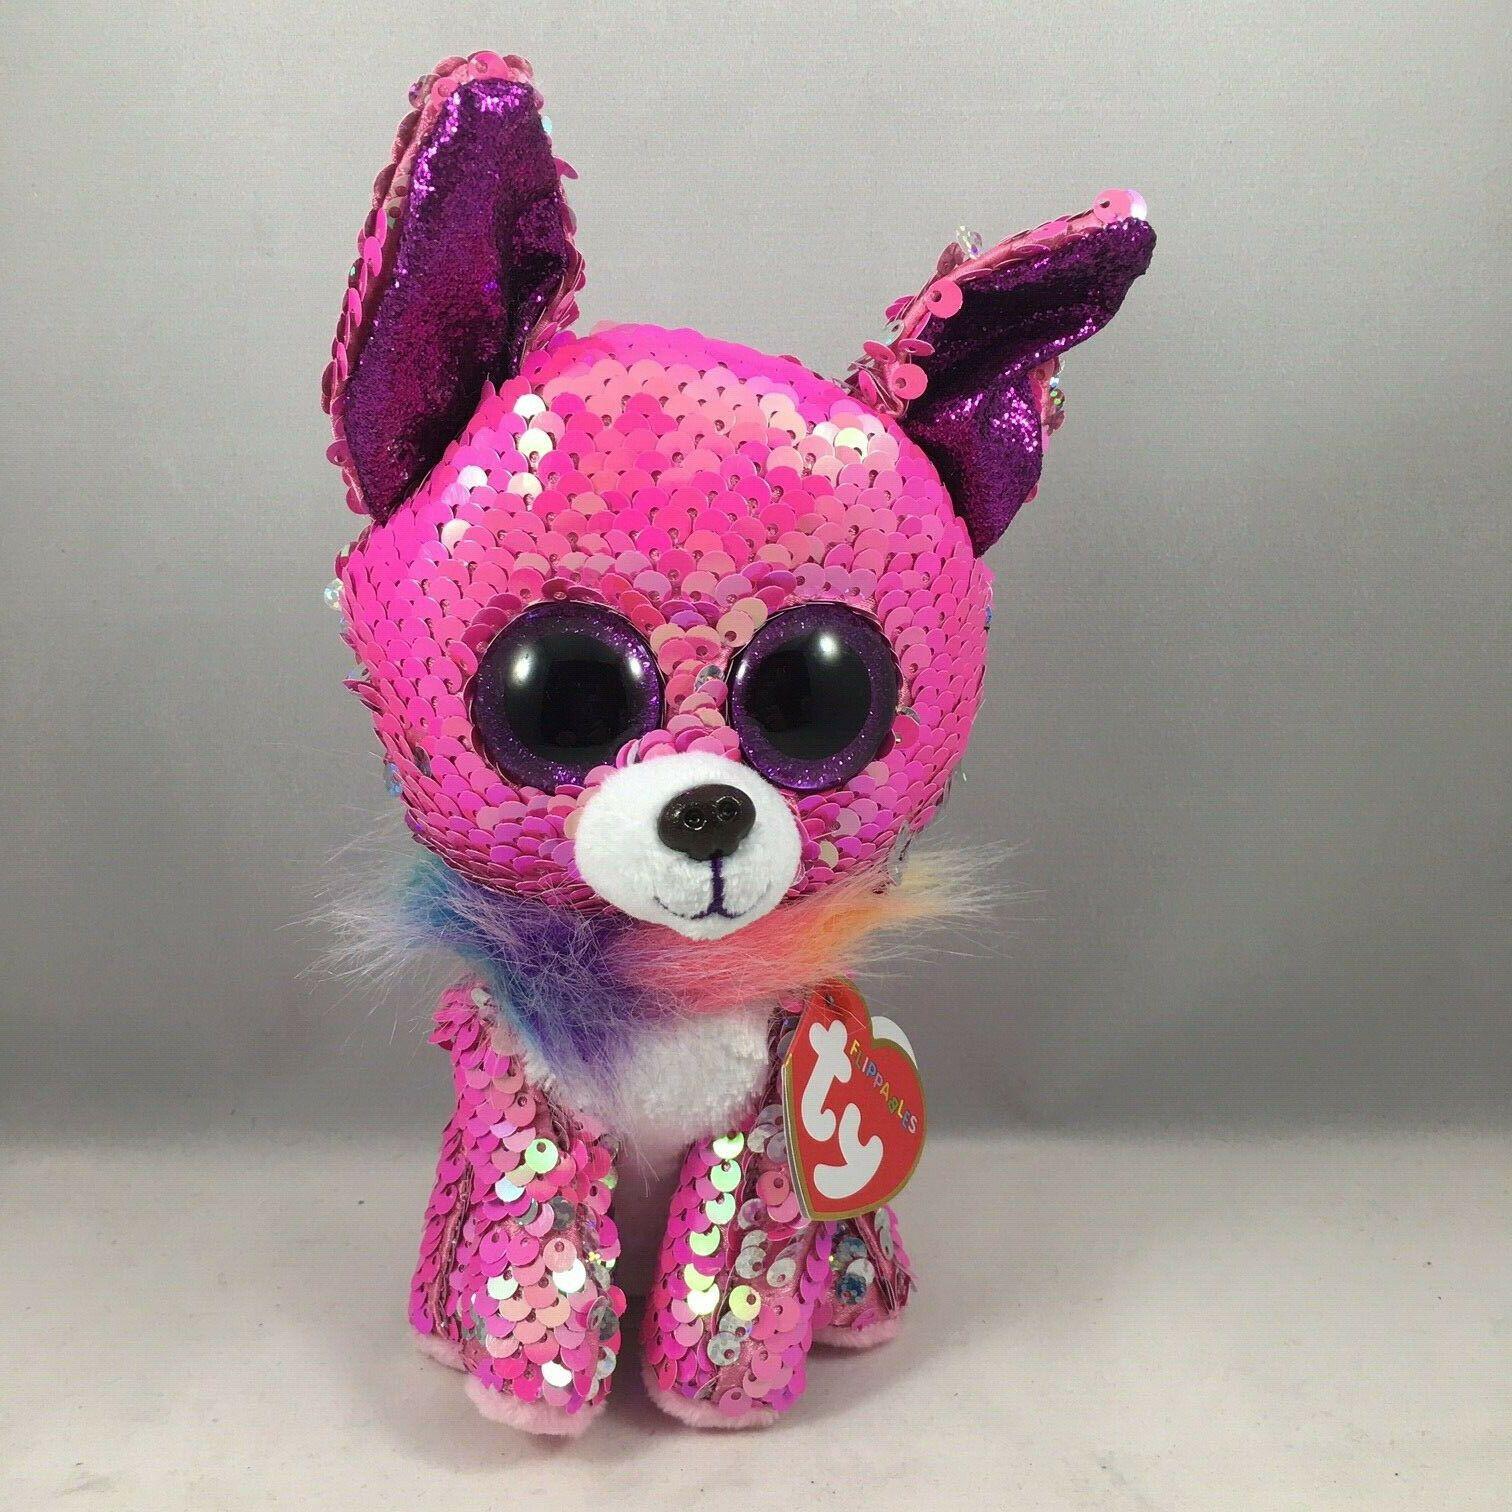 TY Beanie Boos Mini Boo Series 2 Skylar the Dog Figure